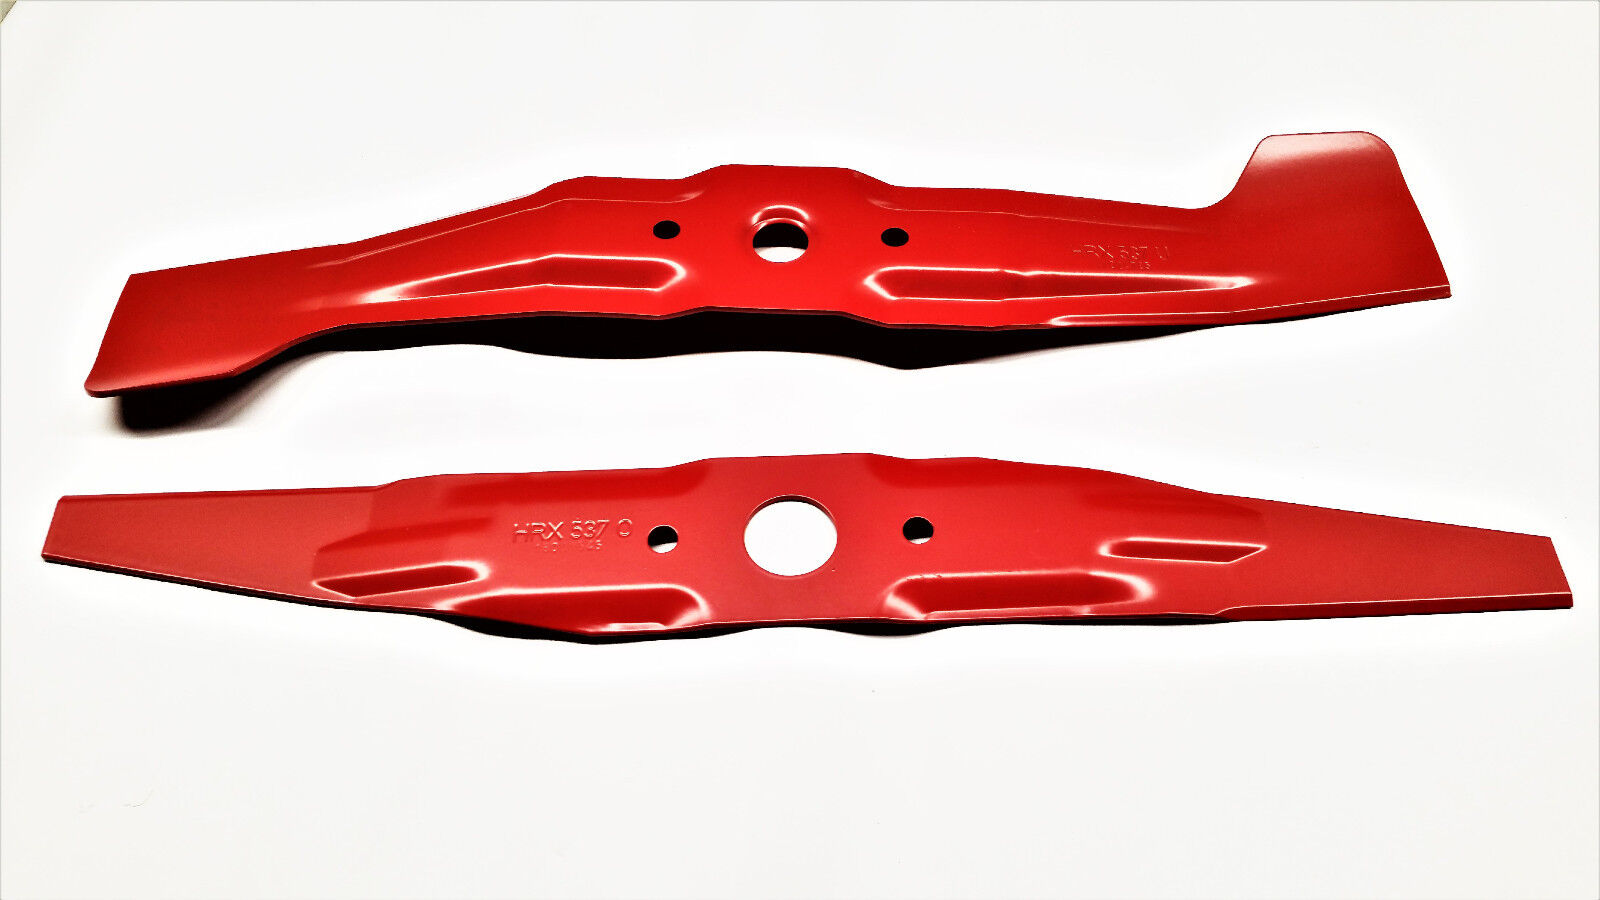 IZY 53 HONDA Rasenmäher Ober Messer Ersatzmesser für HRB 535 HRX 537 HRD 536